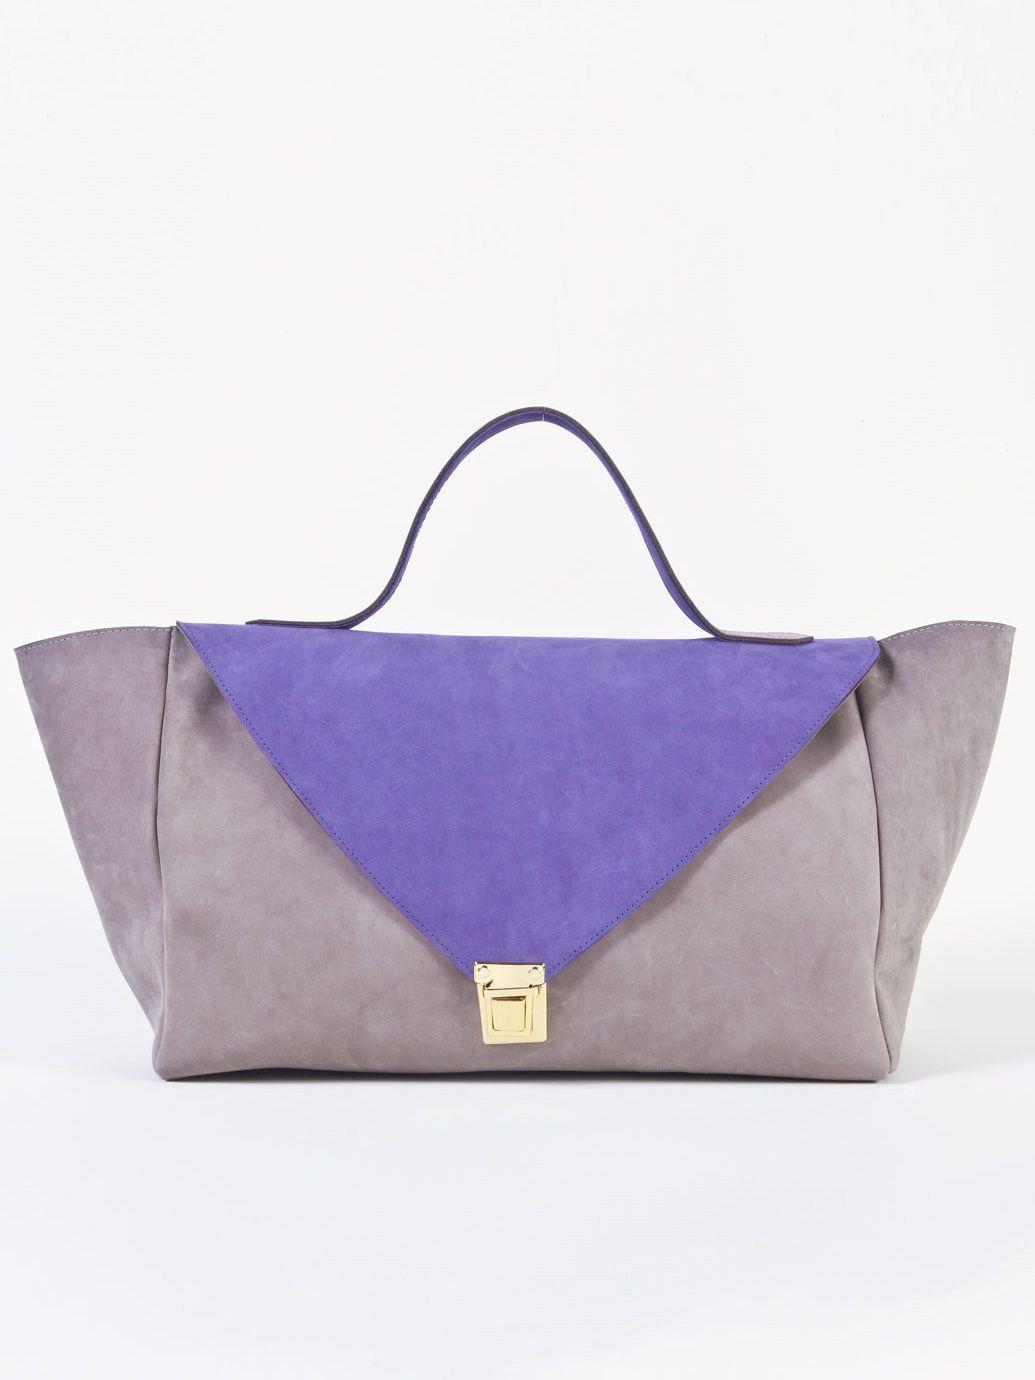 edaac123cef4 American Apparel - Grey   Purple Suede Leather Envelope Case ...